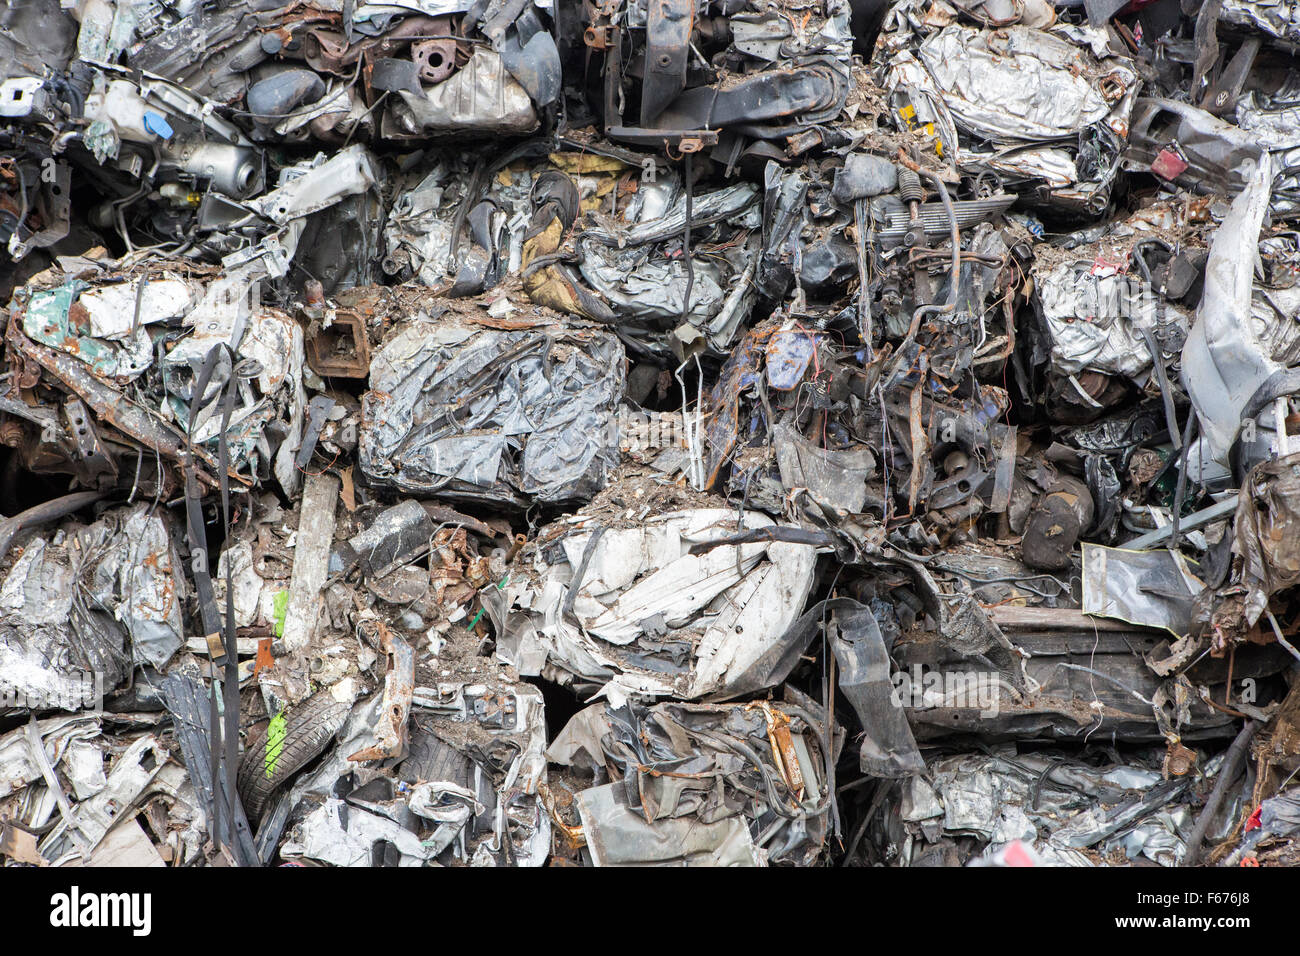 A car recycling scrap yard - Stock Image